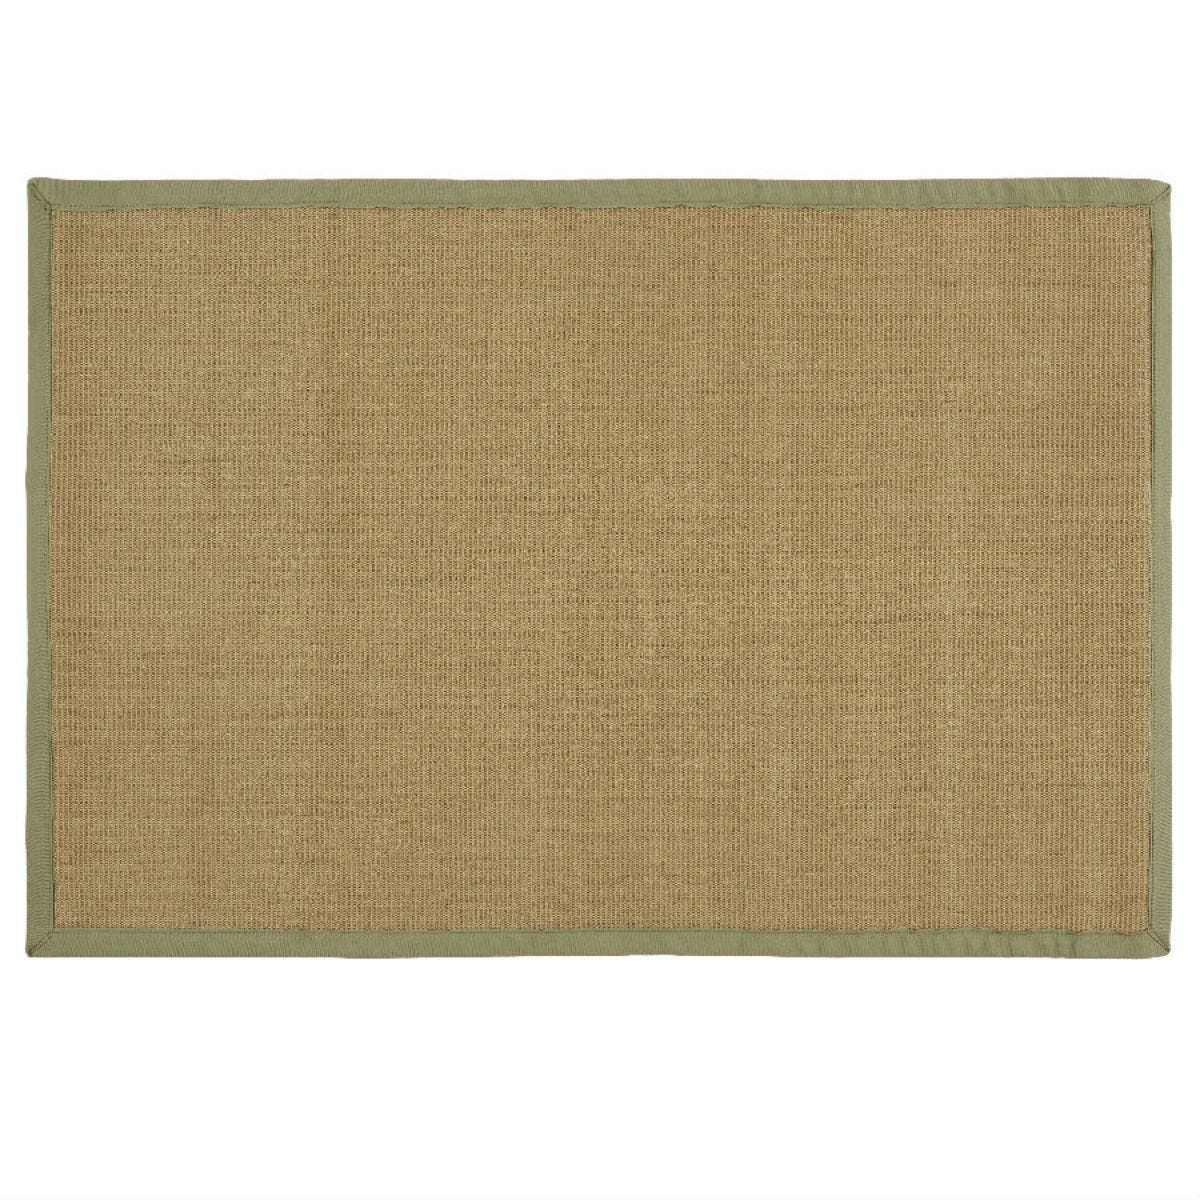 Asiatic Sisal Rug 120 x 180cm - Sage